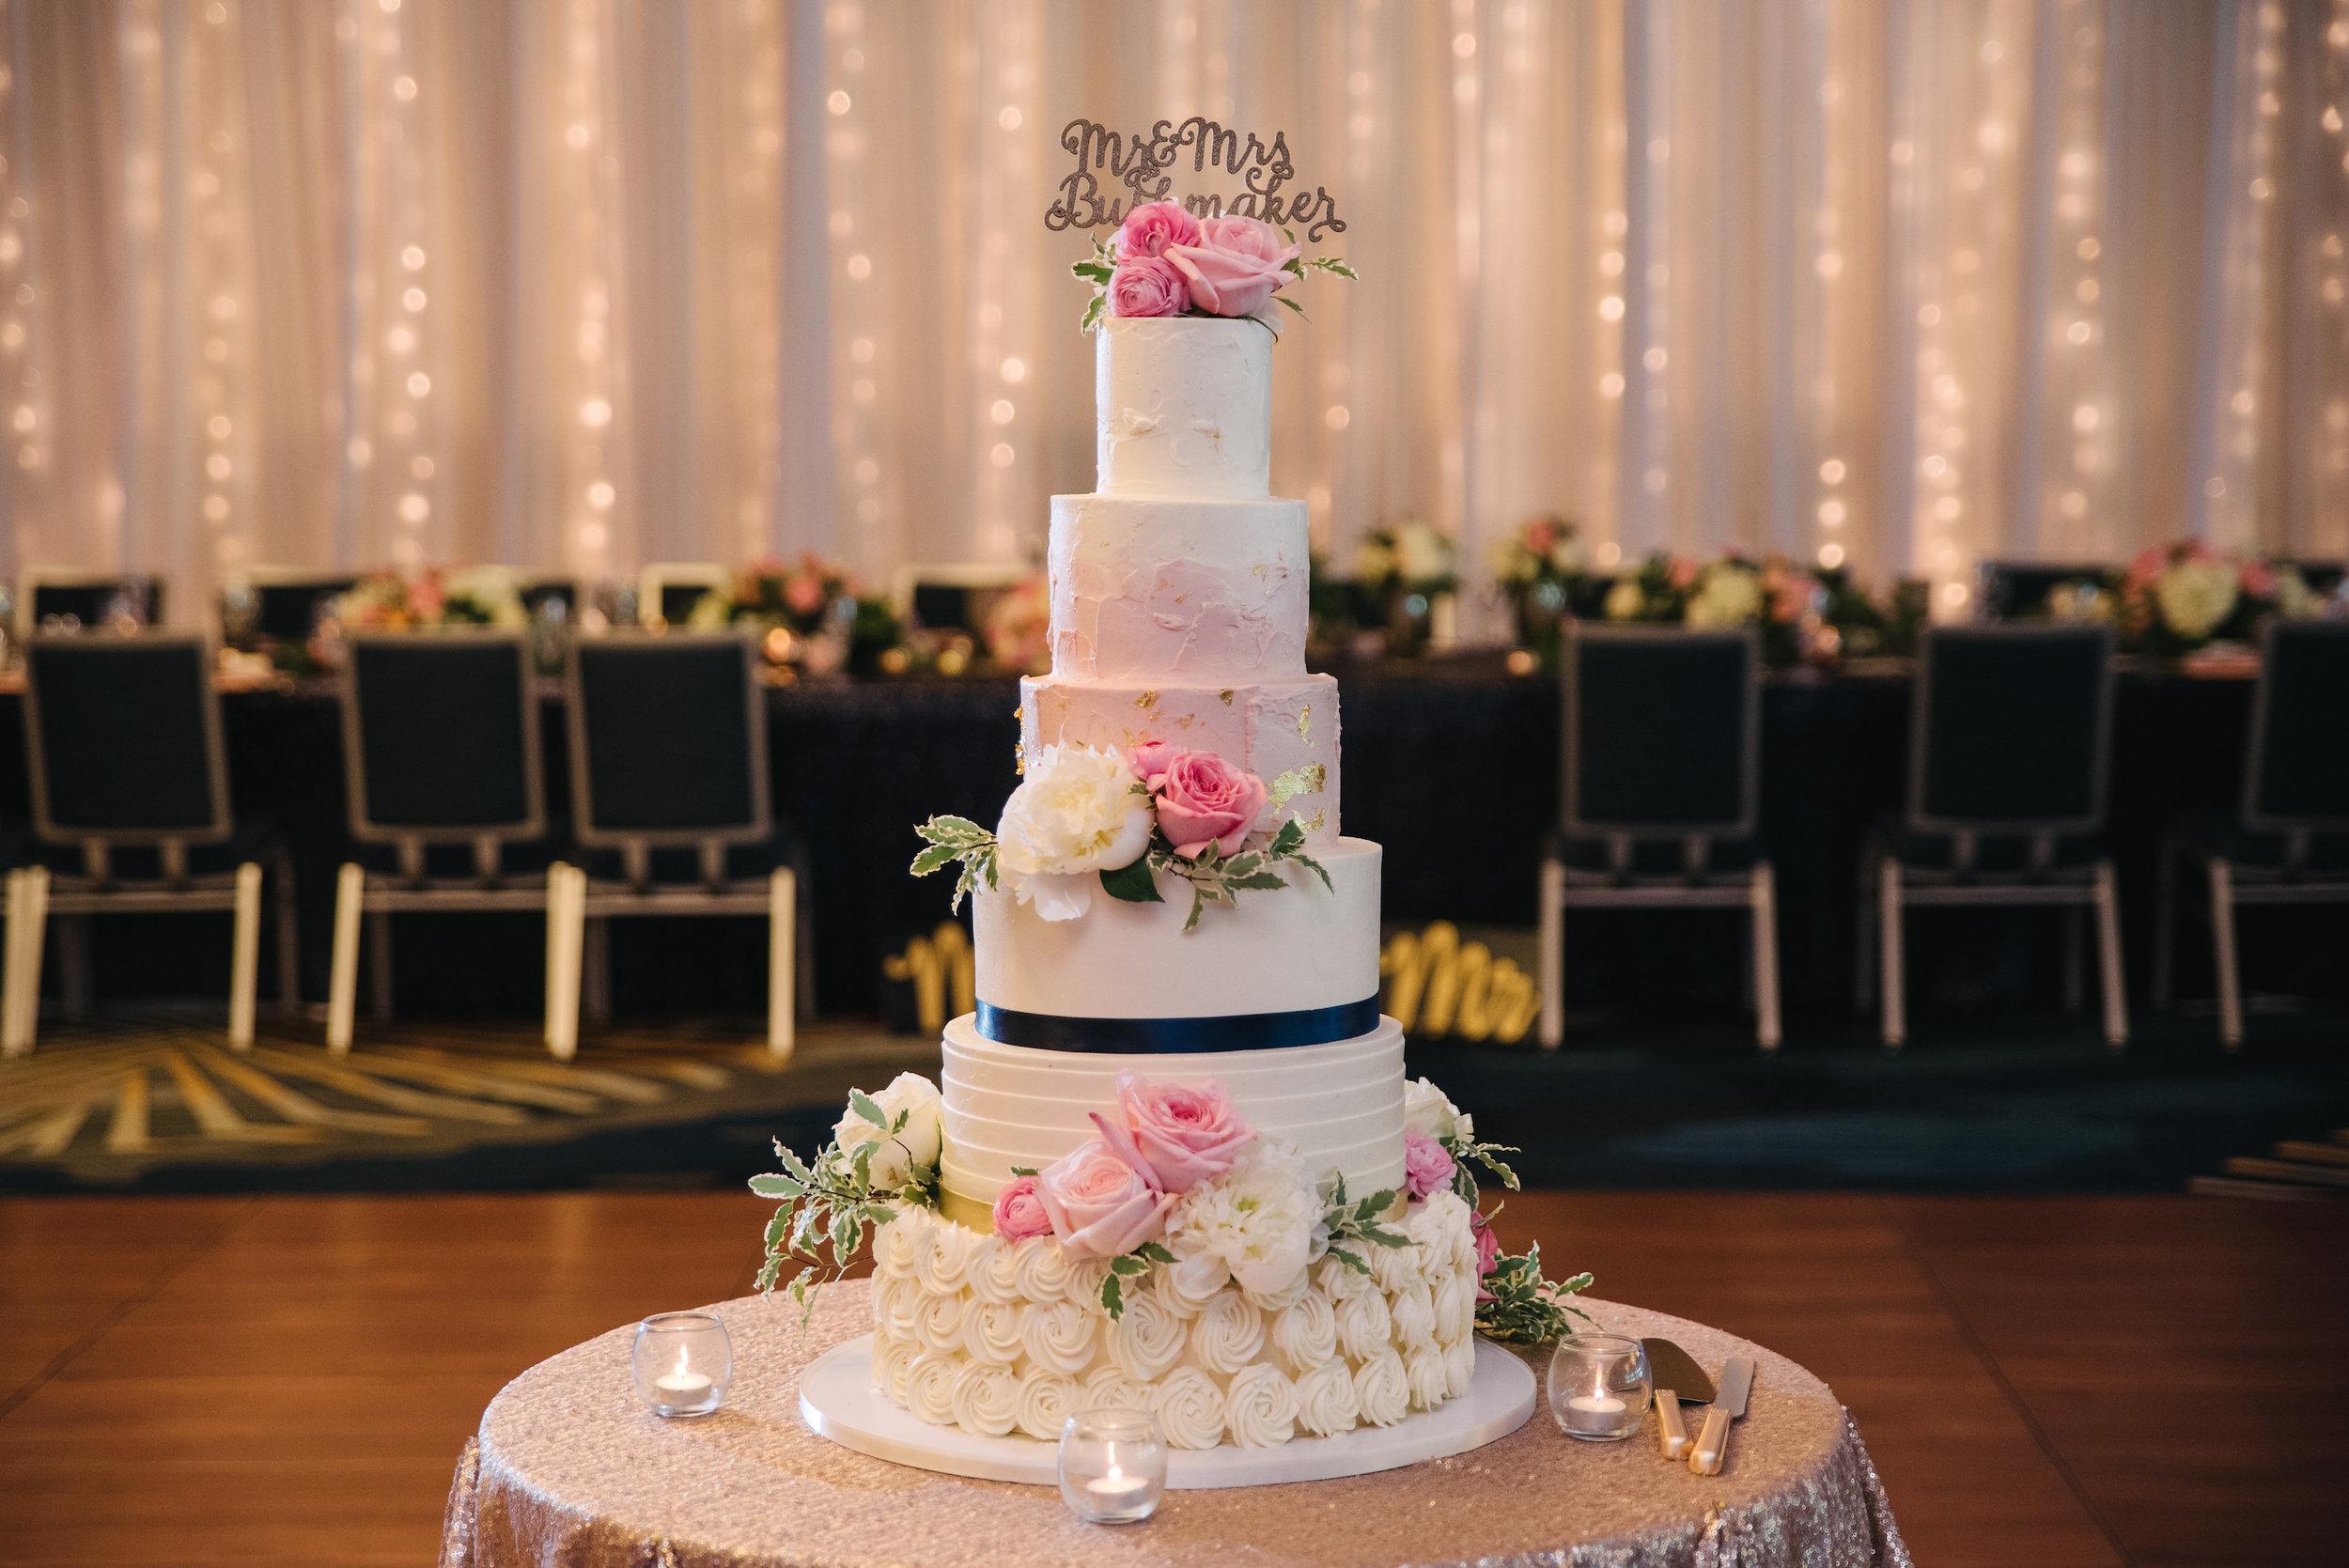 Photo credit: Ali Michelle Photography // Cake: Julie Michelle Cakes // Florist: Treasure Hut // Wedding Planning:   Graceful Events